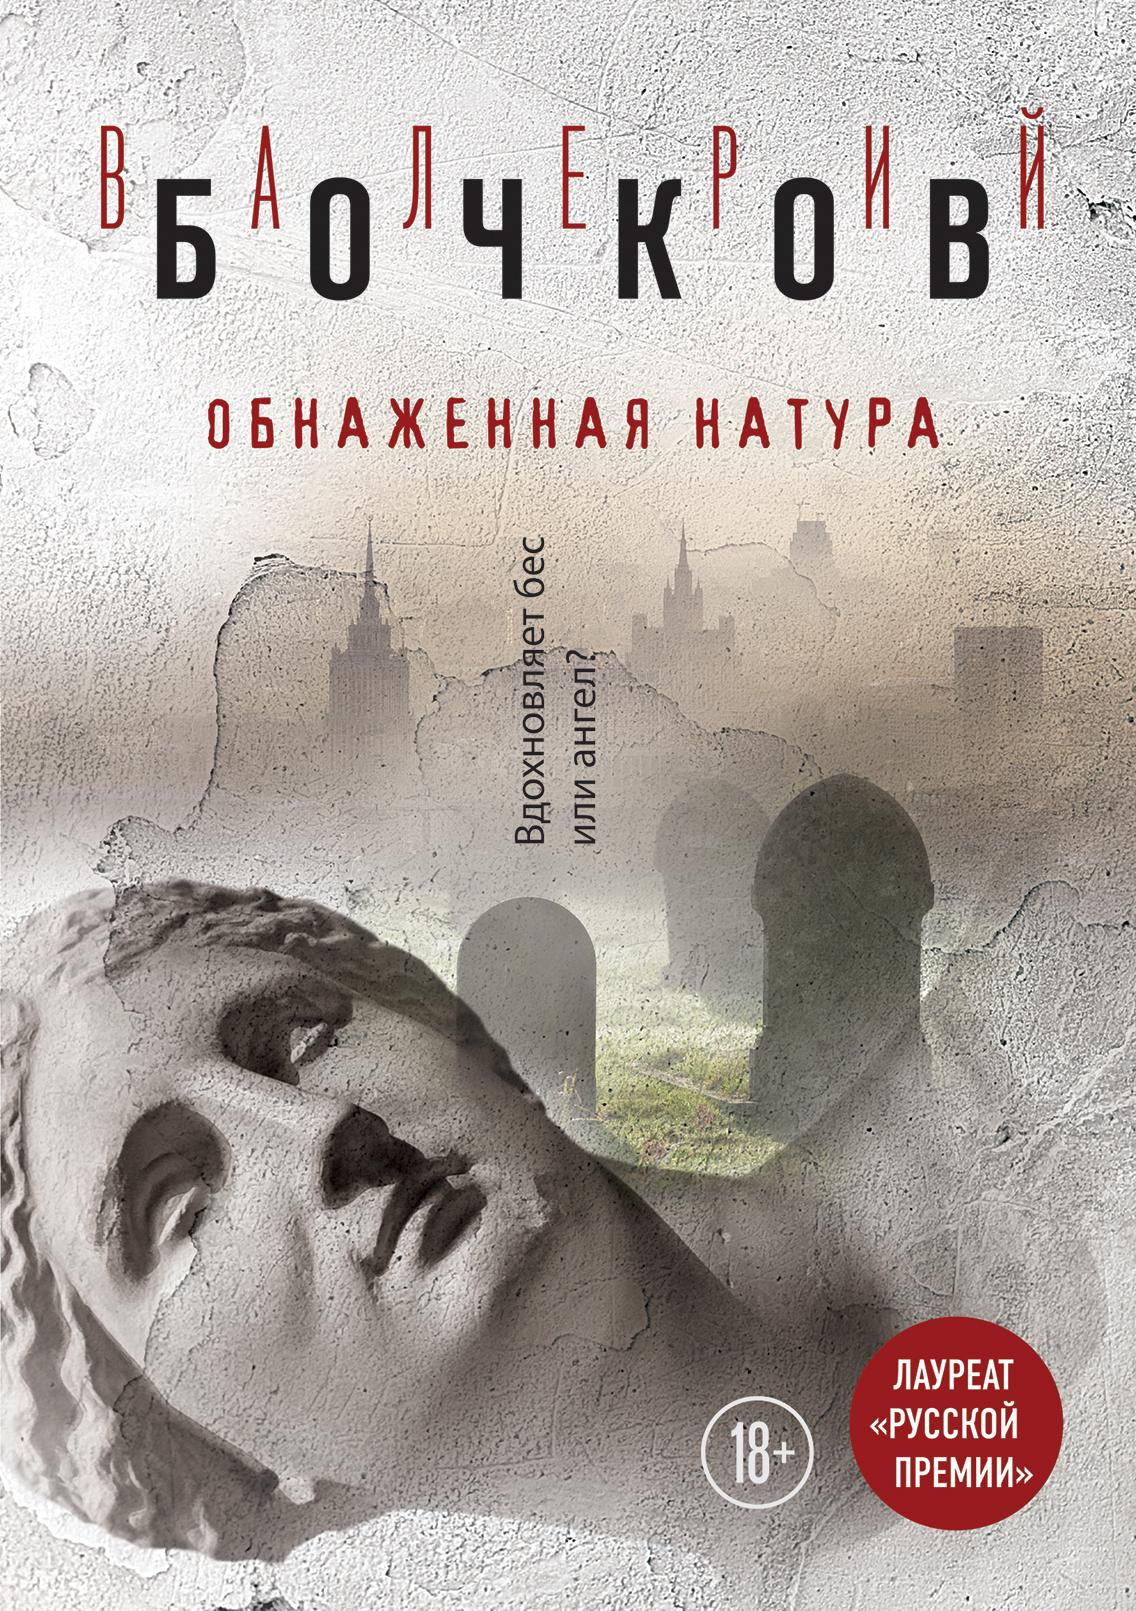 Валерий Бочков Обнаженная натура